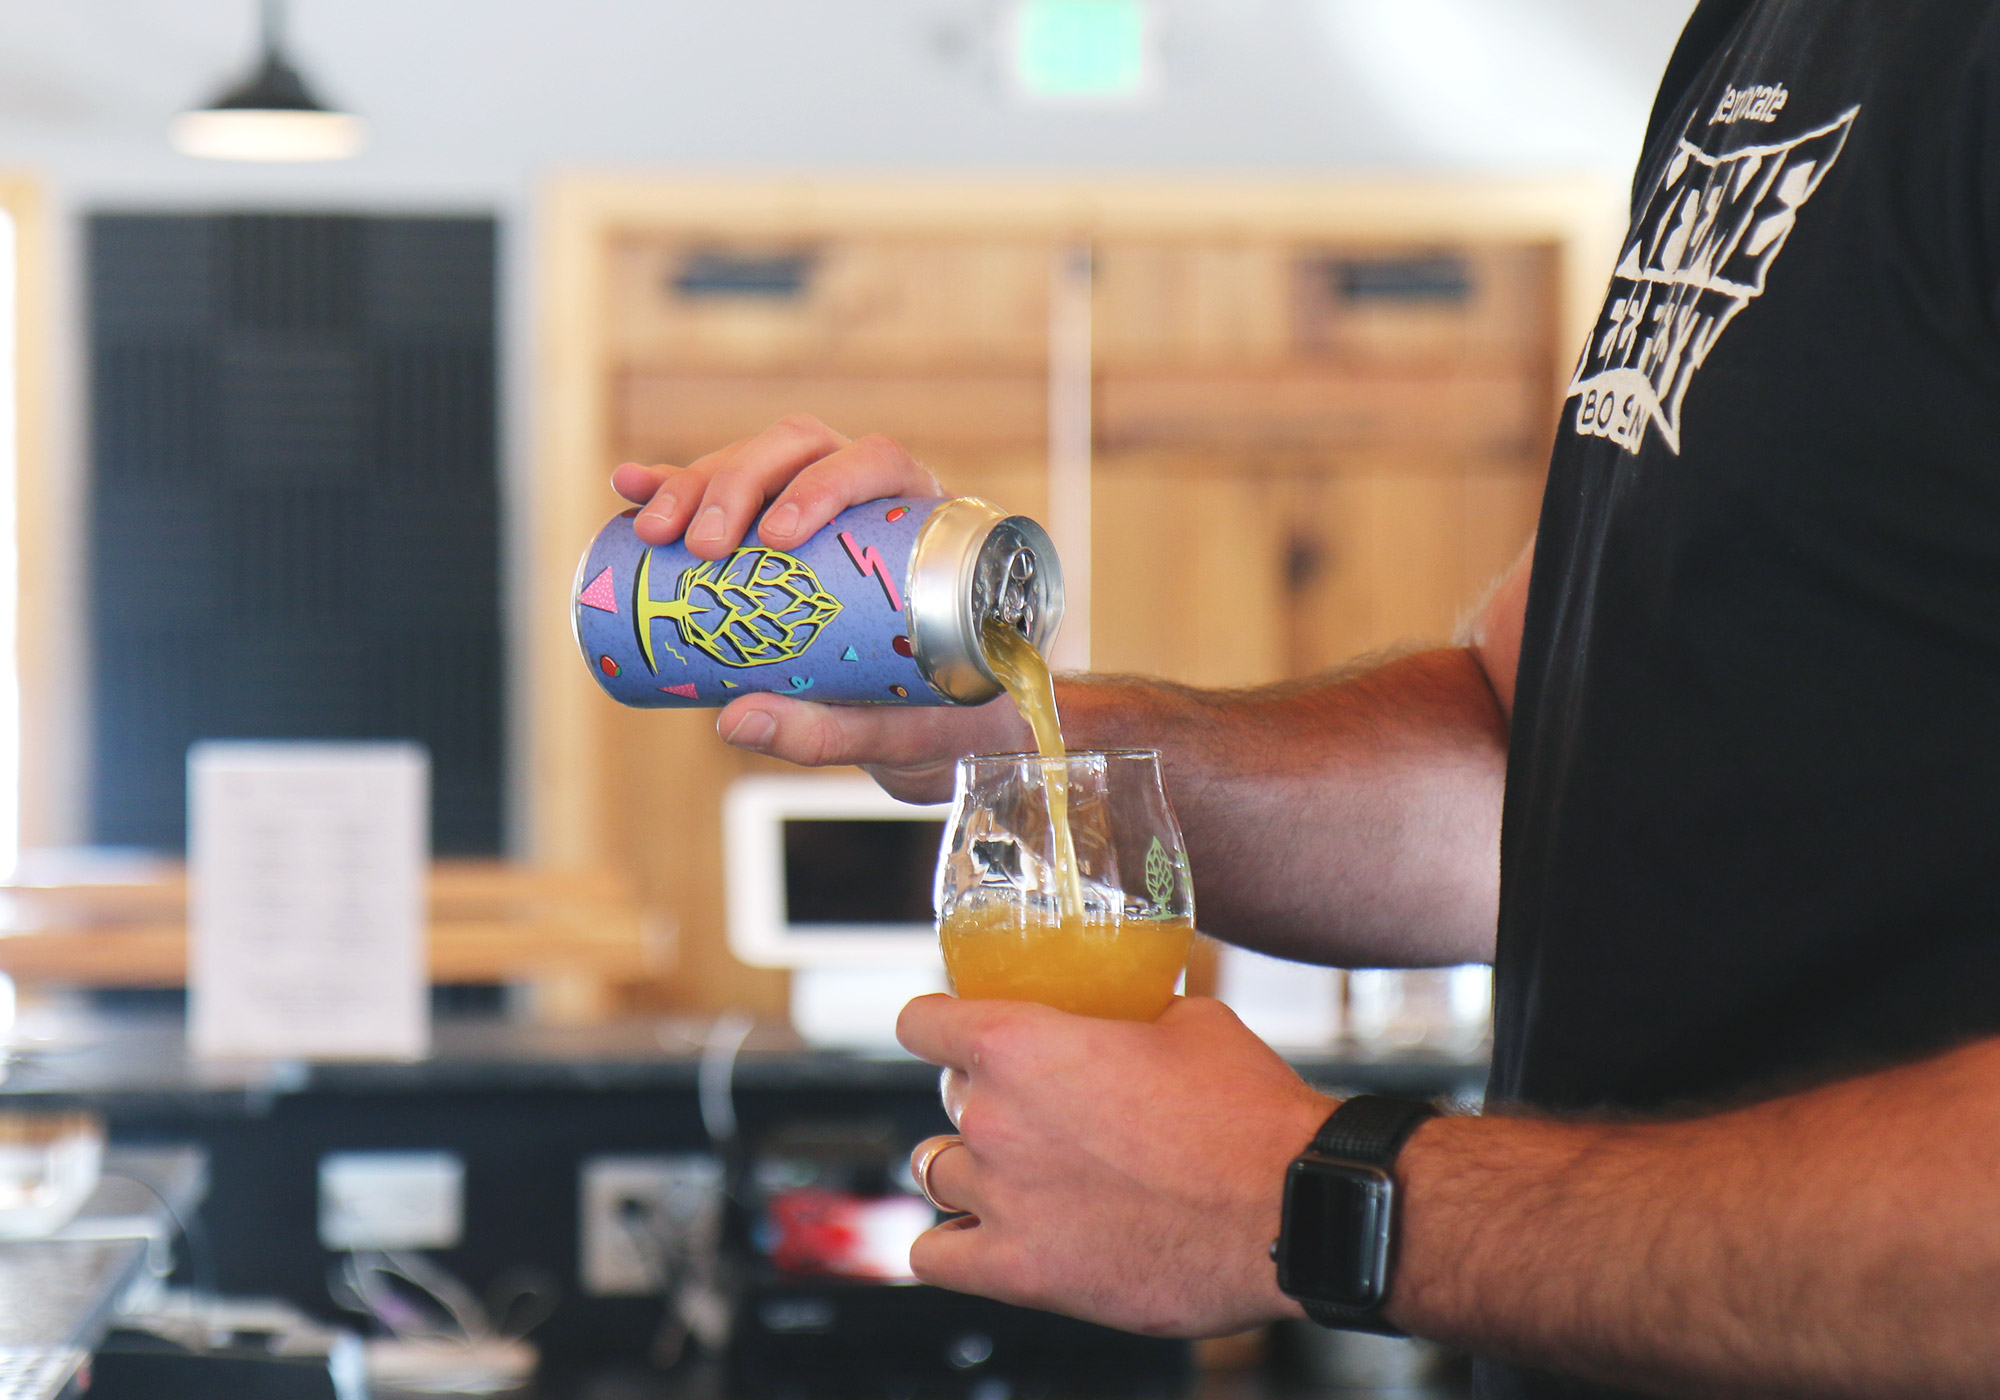 Detour: Port Crane, NY – Beer Tree Brew Co.